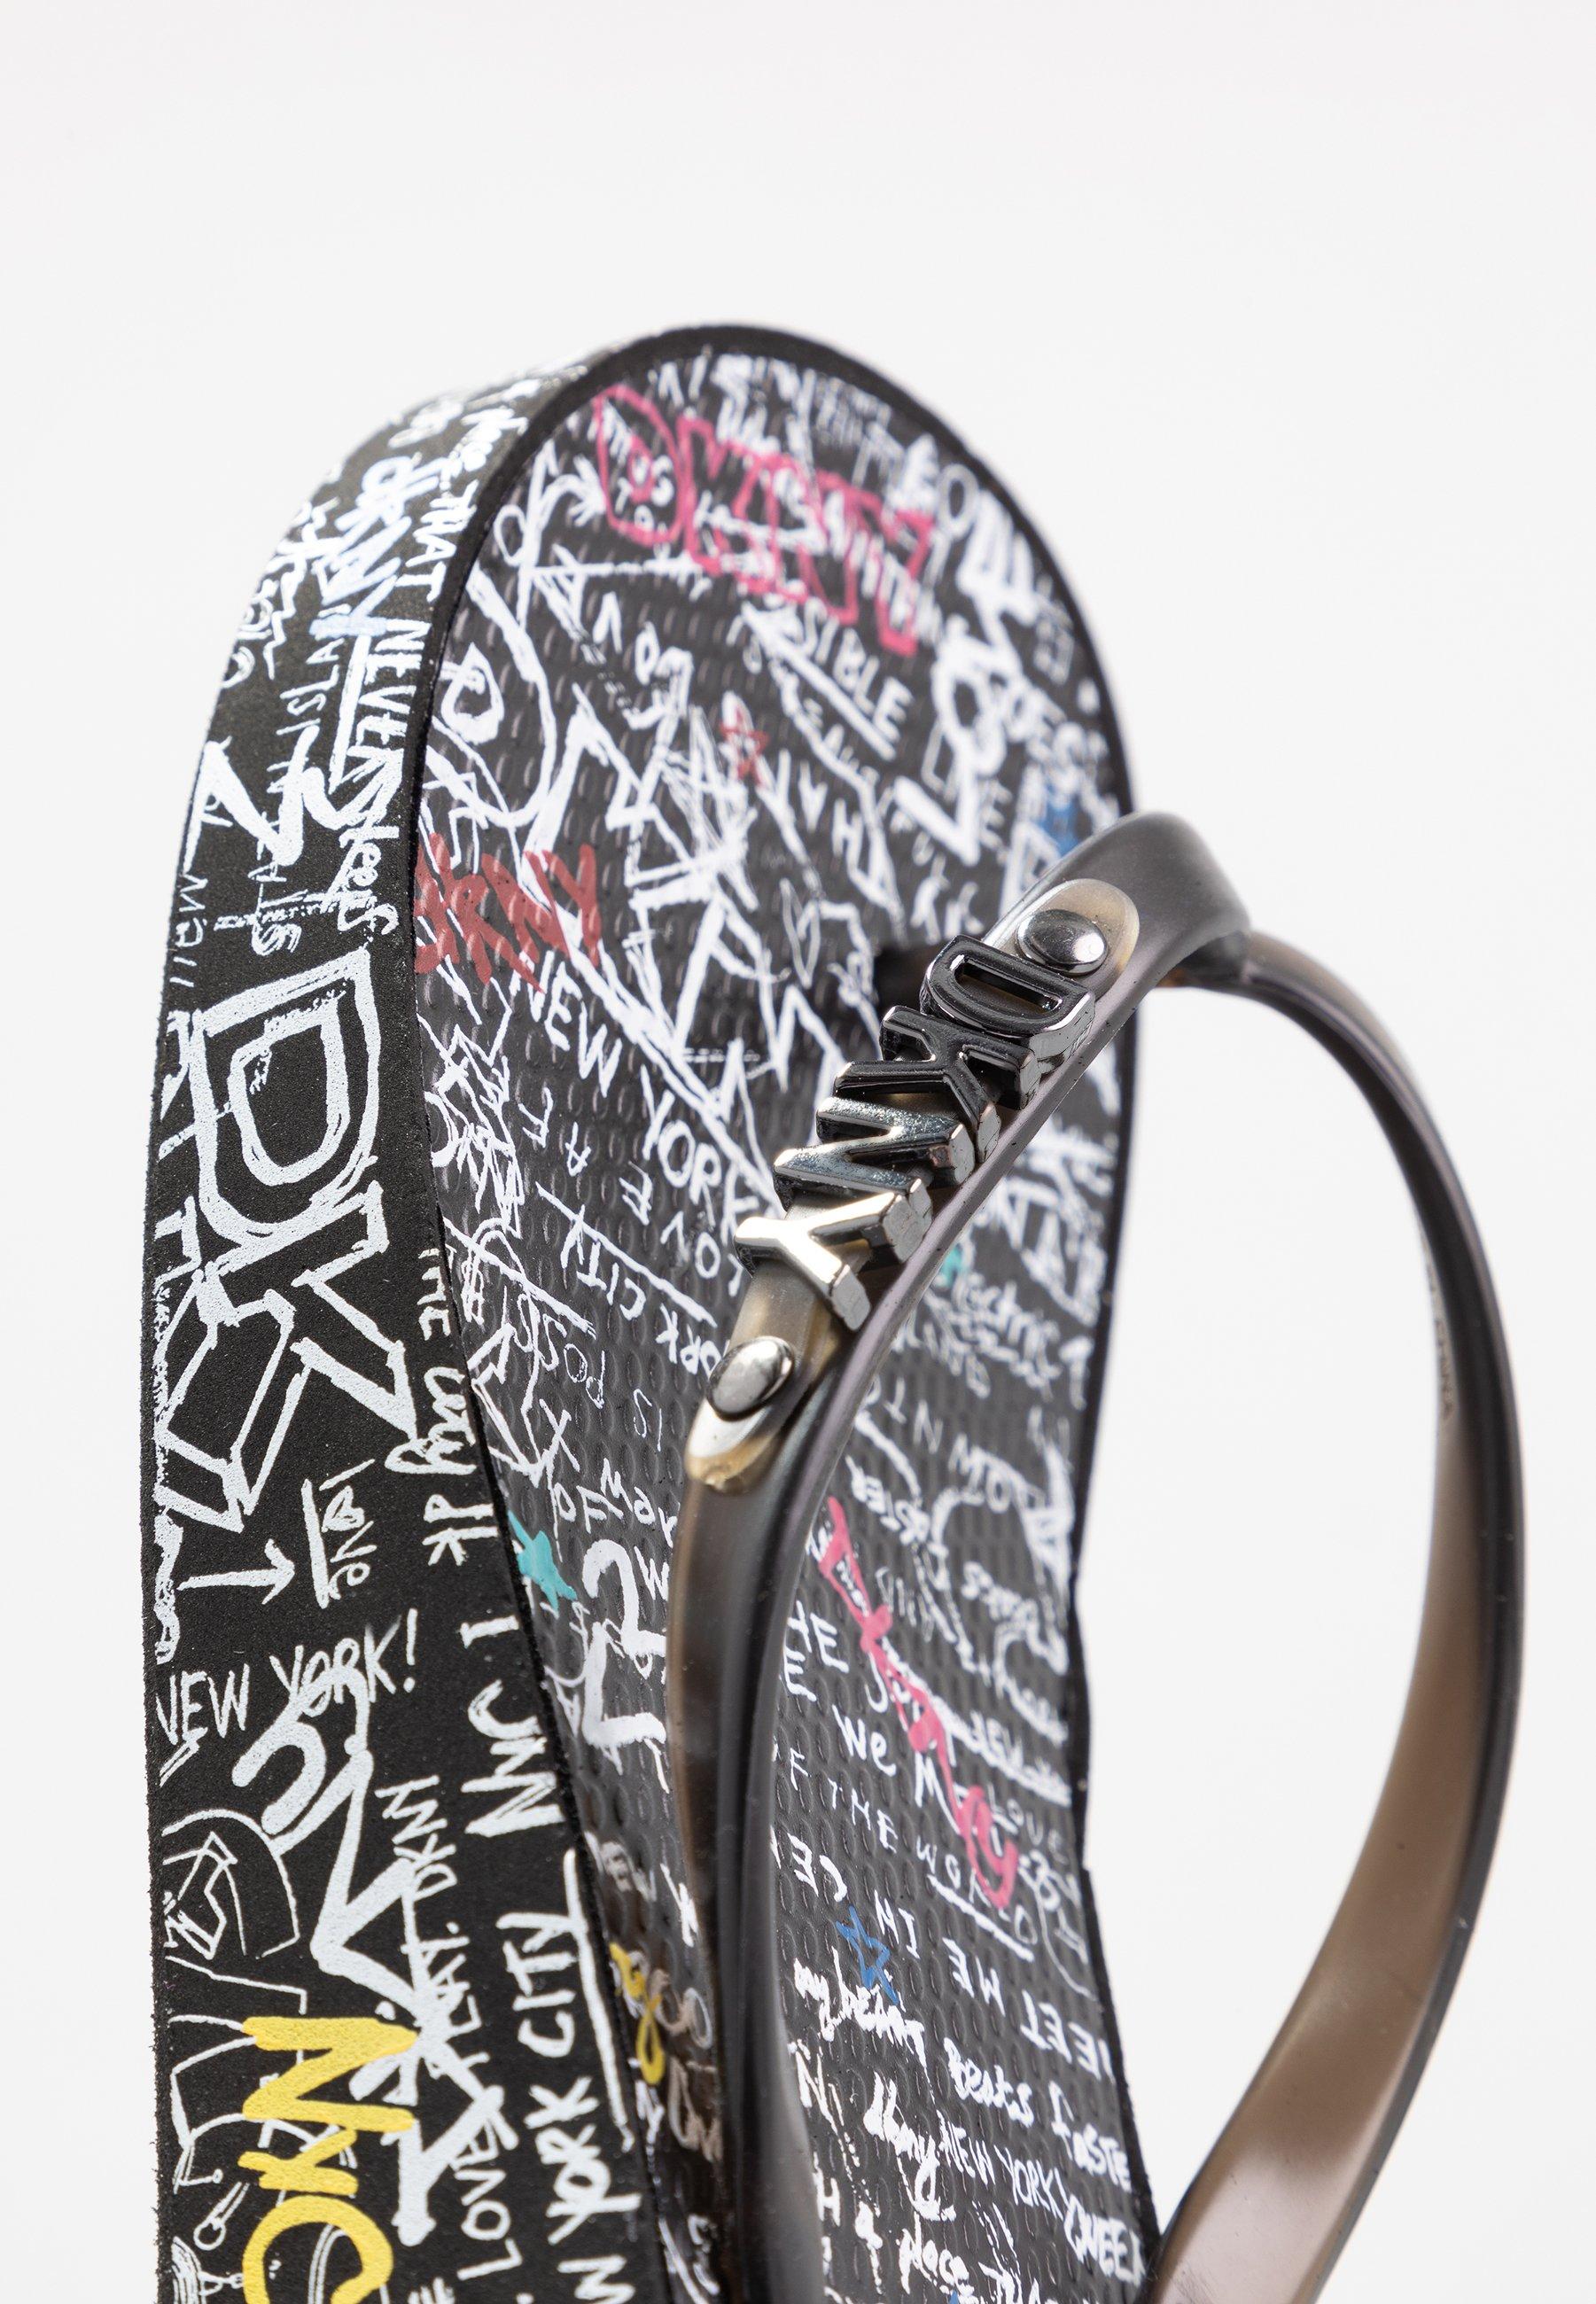 DKNY JAZZI  - Zehentrenner - black/multicolor   Damen Schuhe 2020